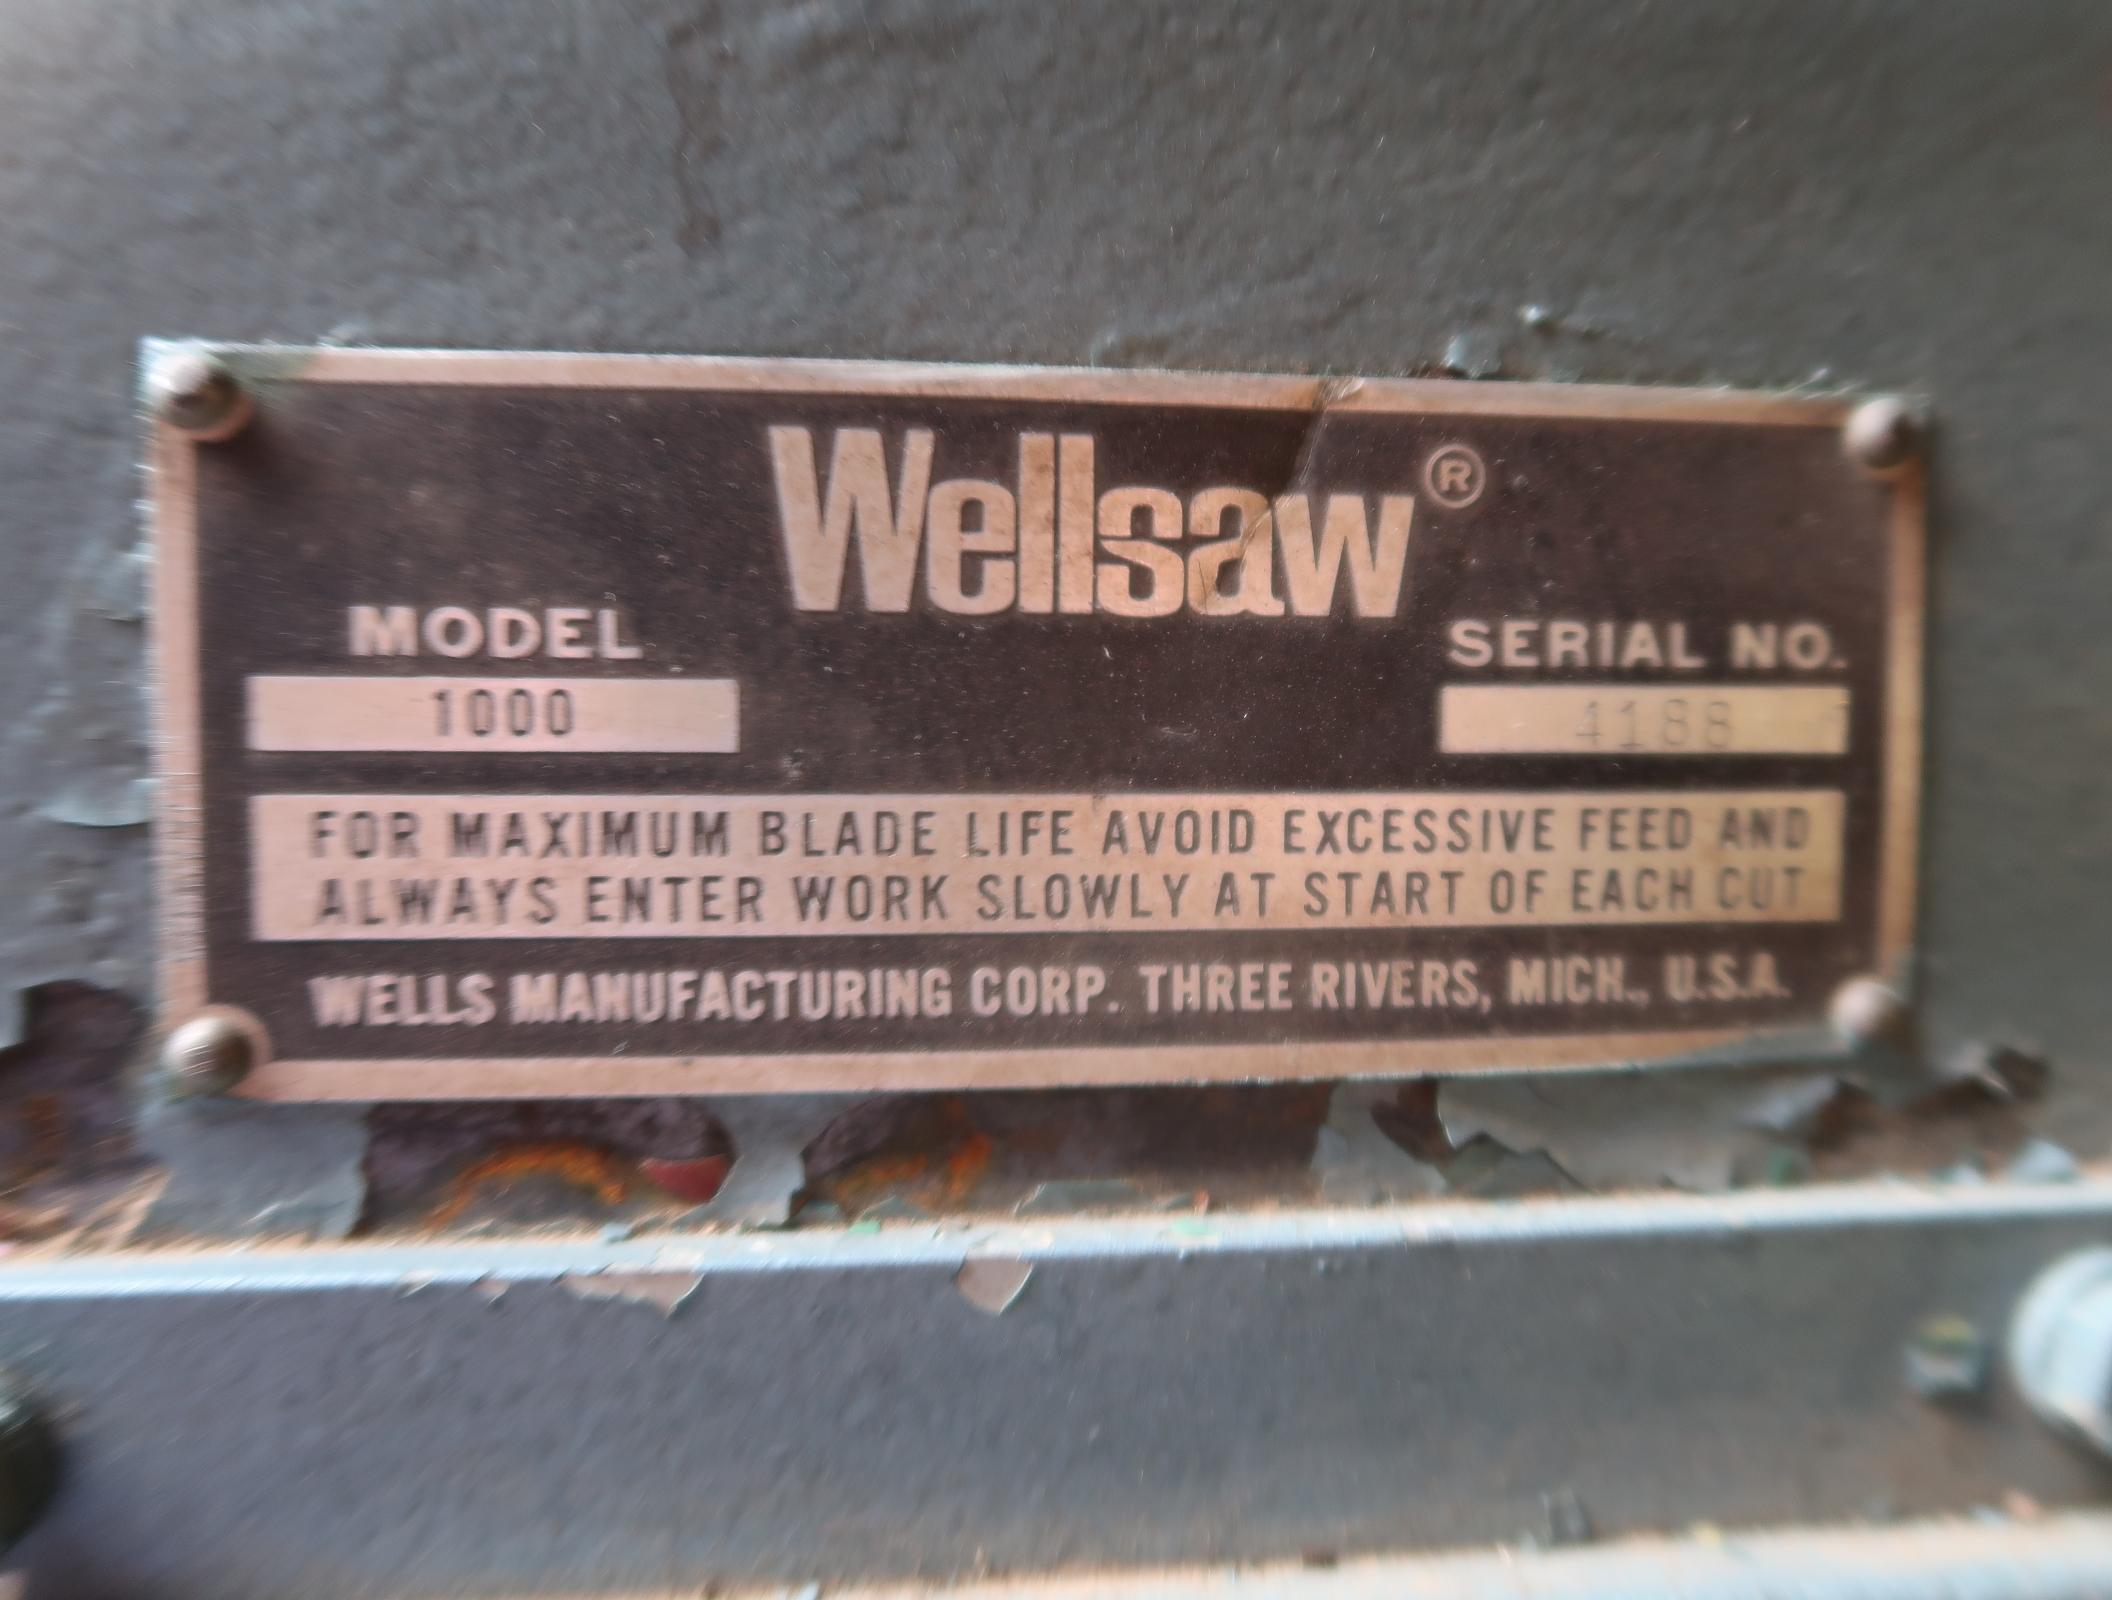 "WELLSAW MDL 1000, 10"" X 16"" HORIZONTAL BAND SAW SN. 4188 - Image 2 of 2"